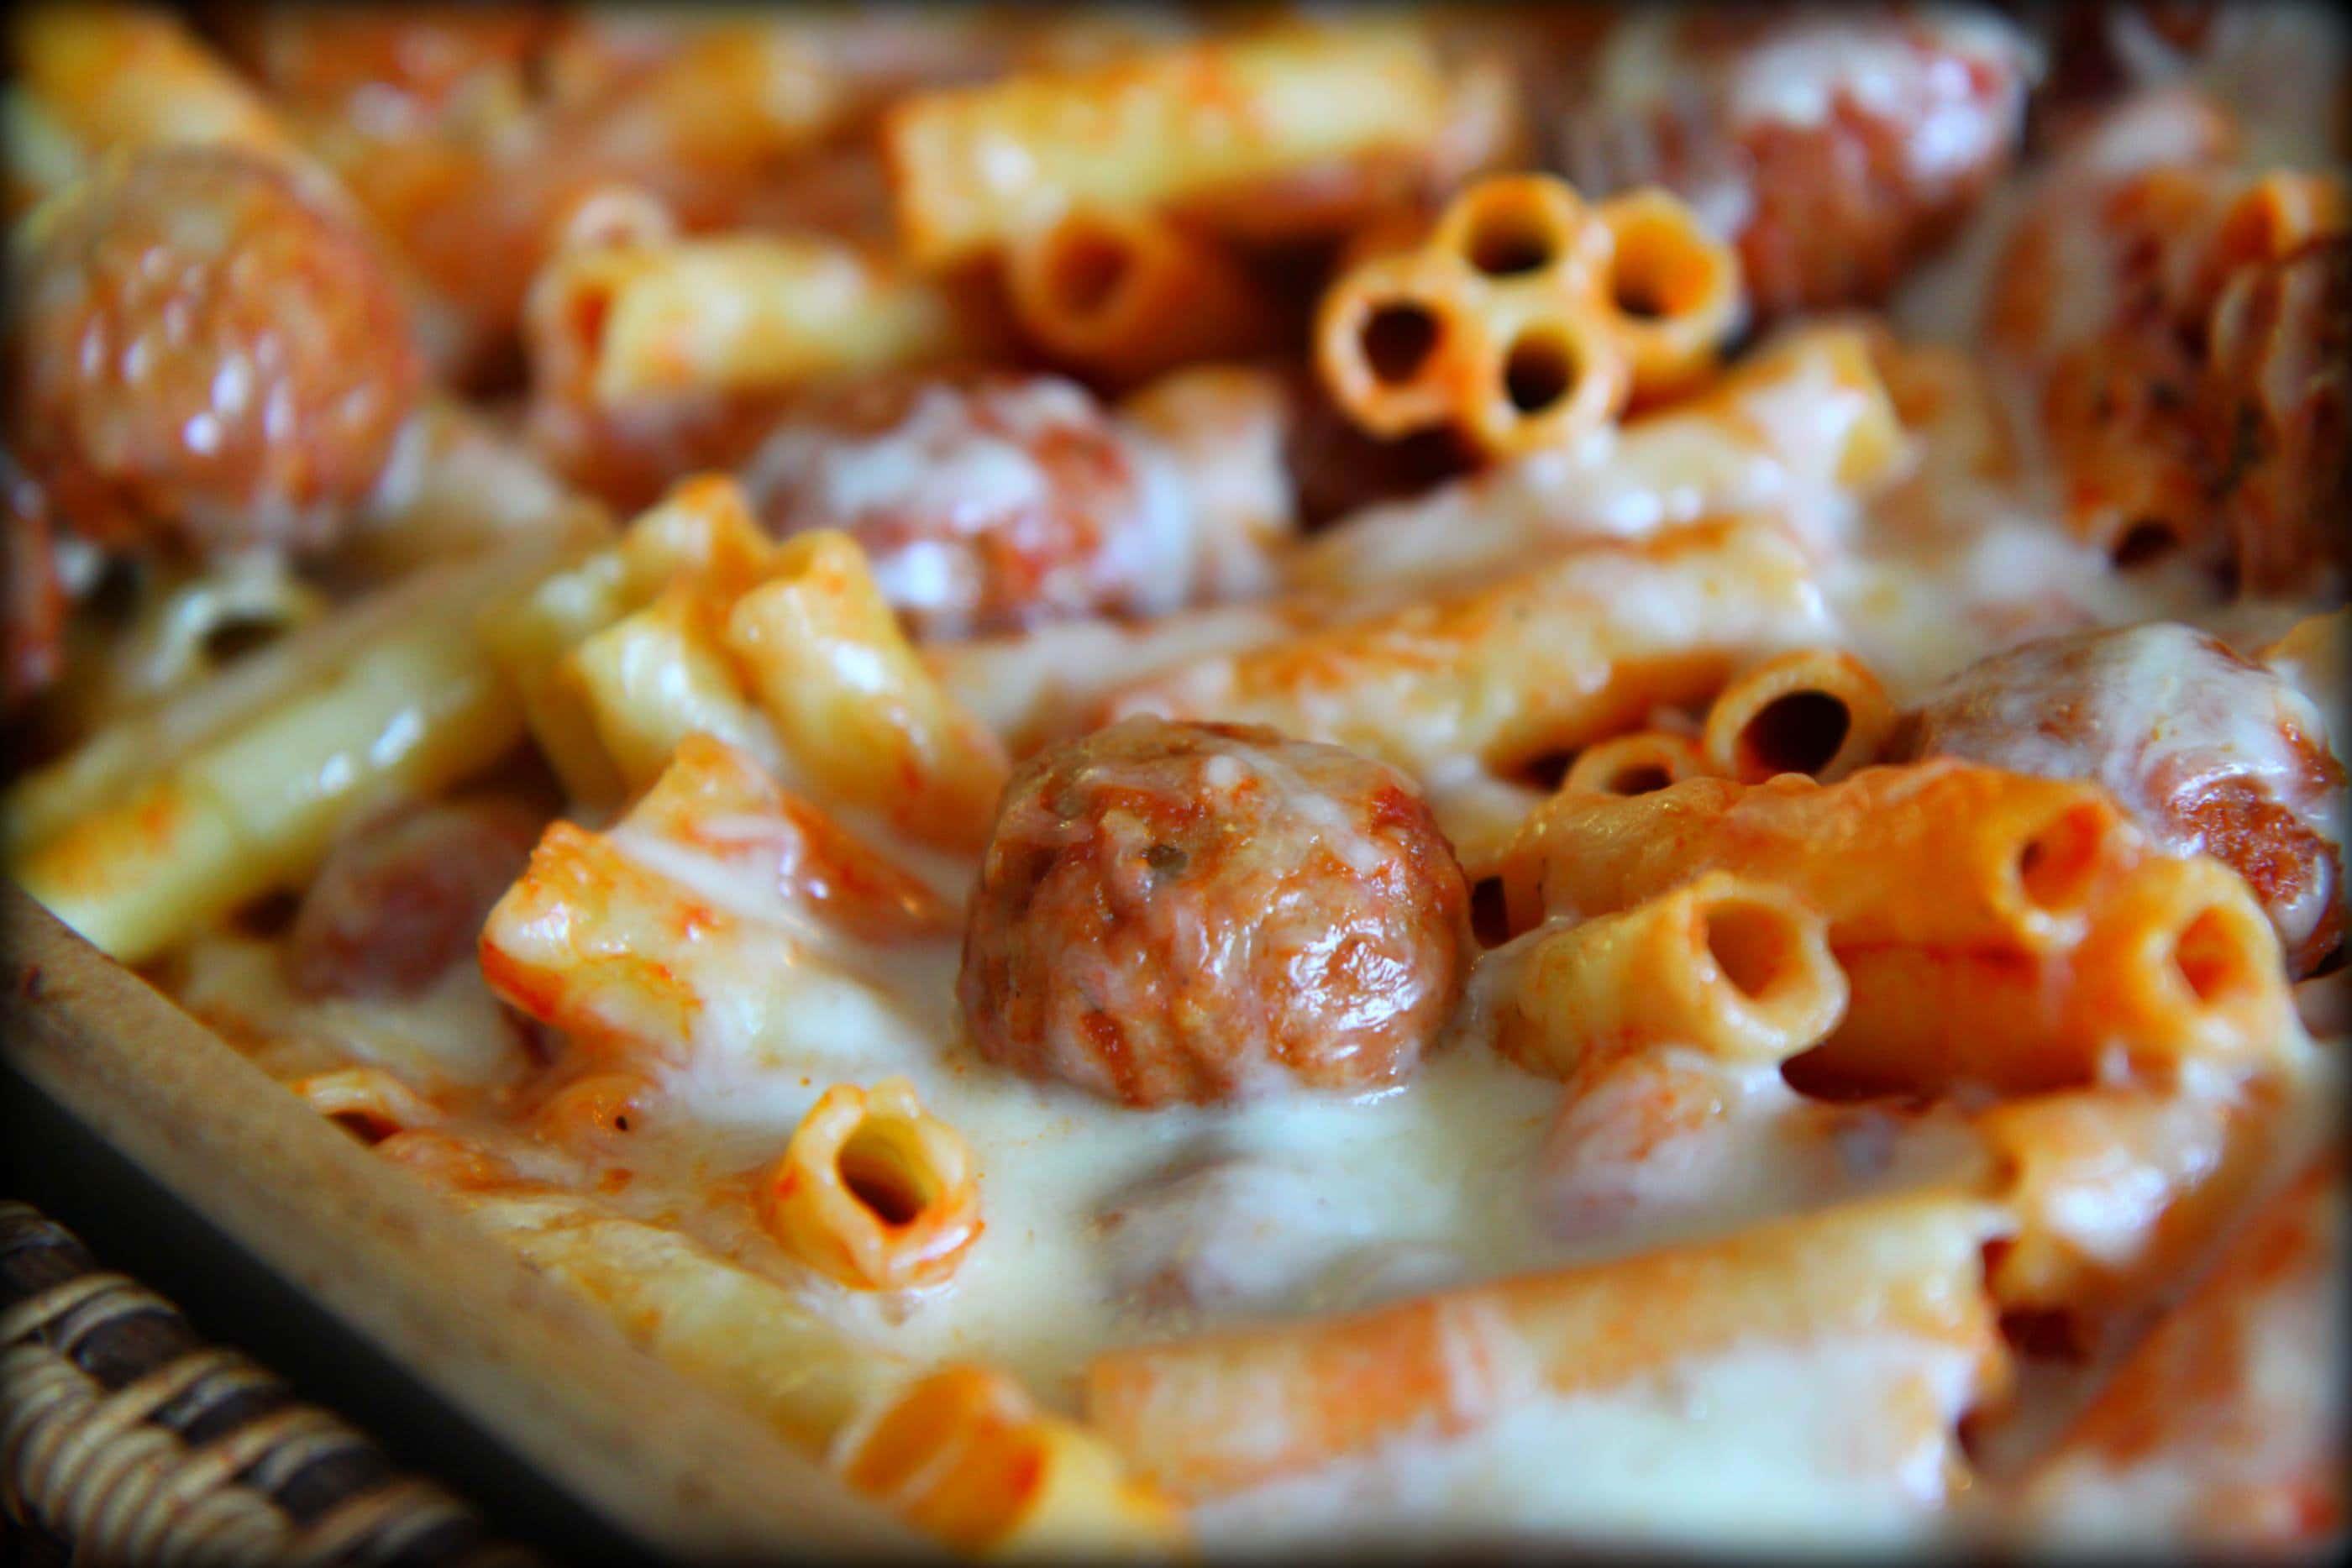 ... × 1867 in Quick Weeknight Dinner: Baked Ziti With Turkey Meatballs